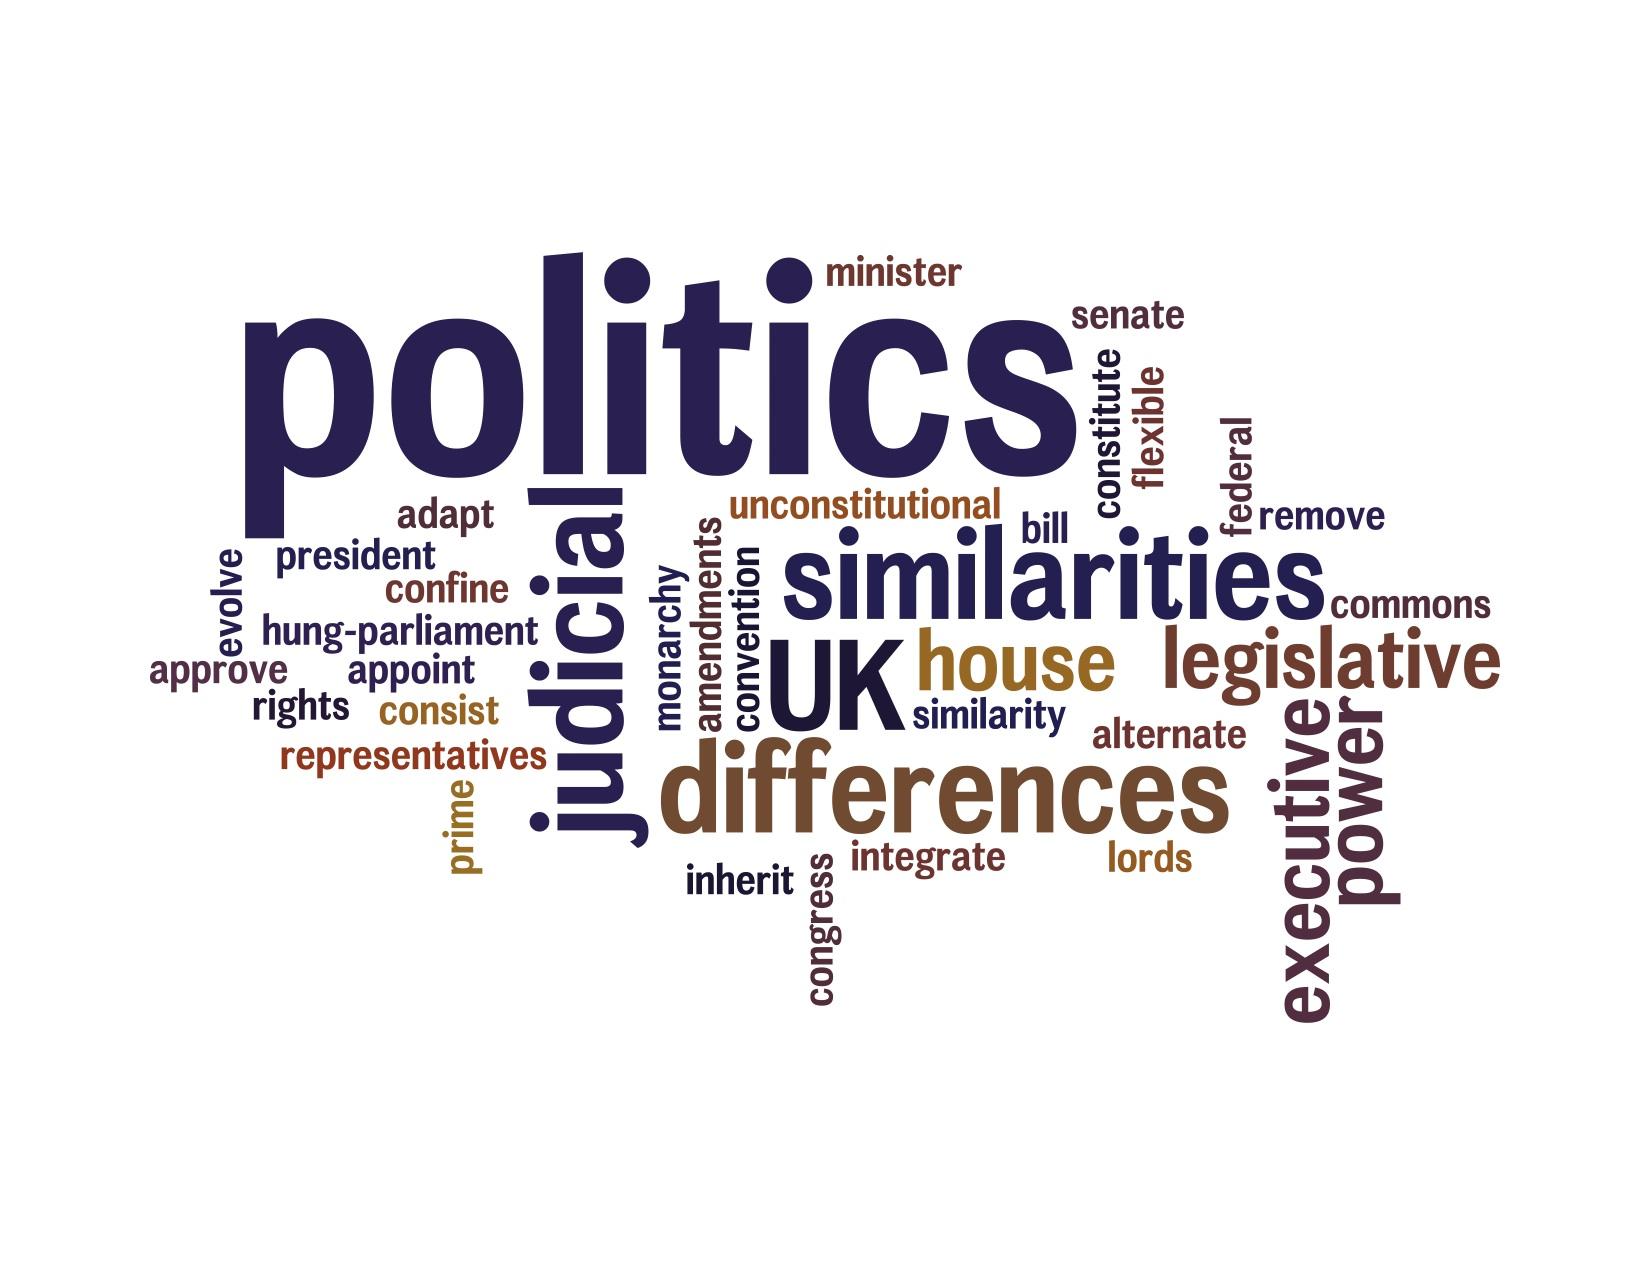 2015-05-02-politics 2